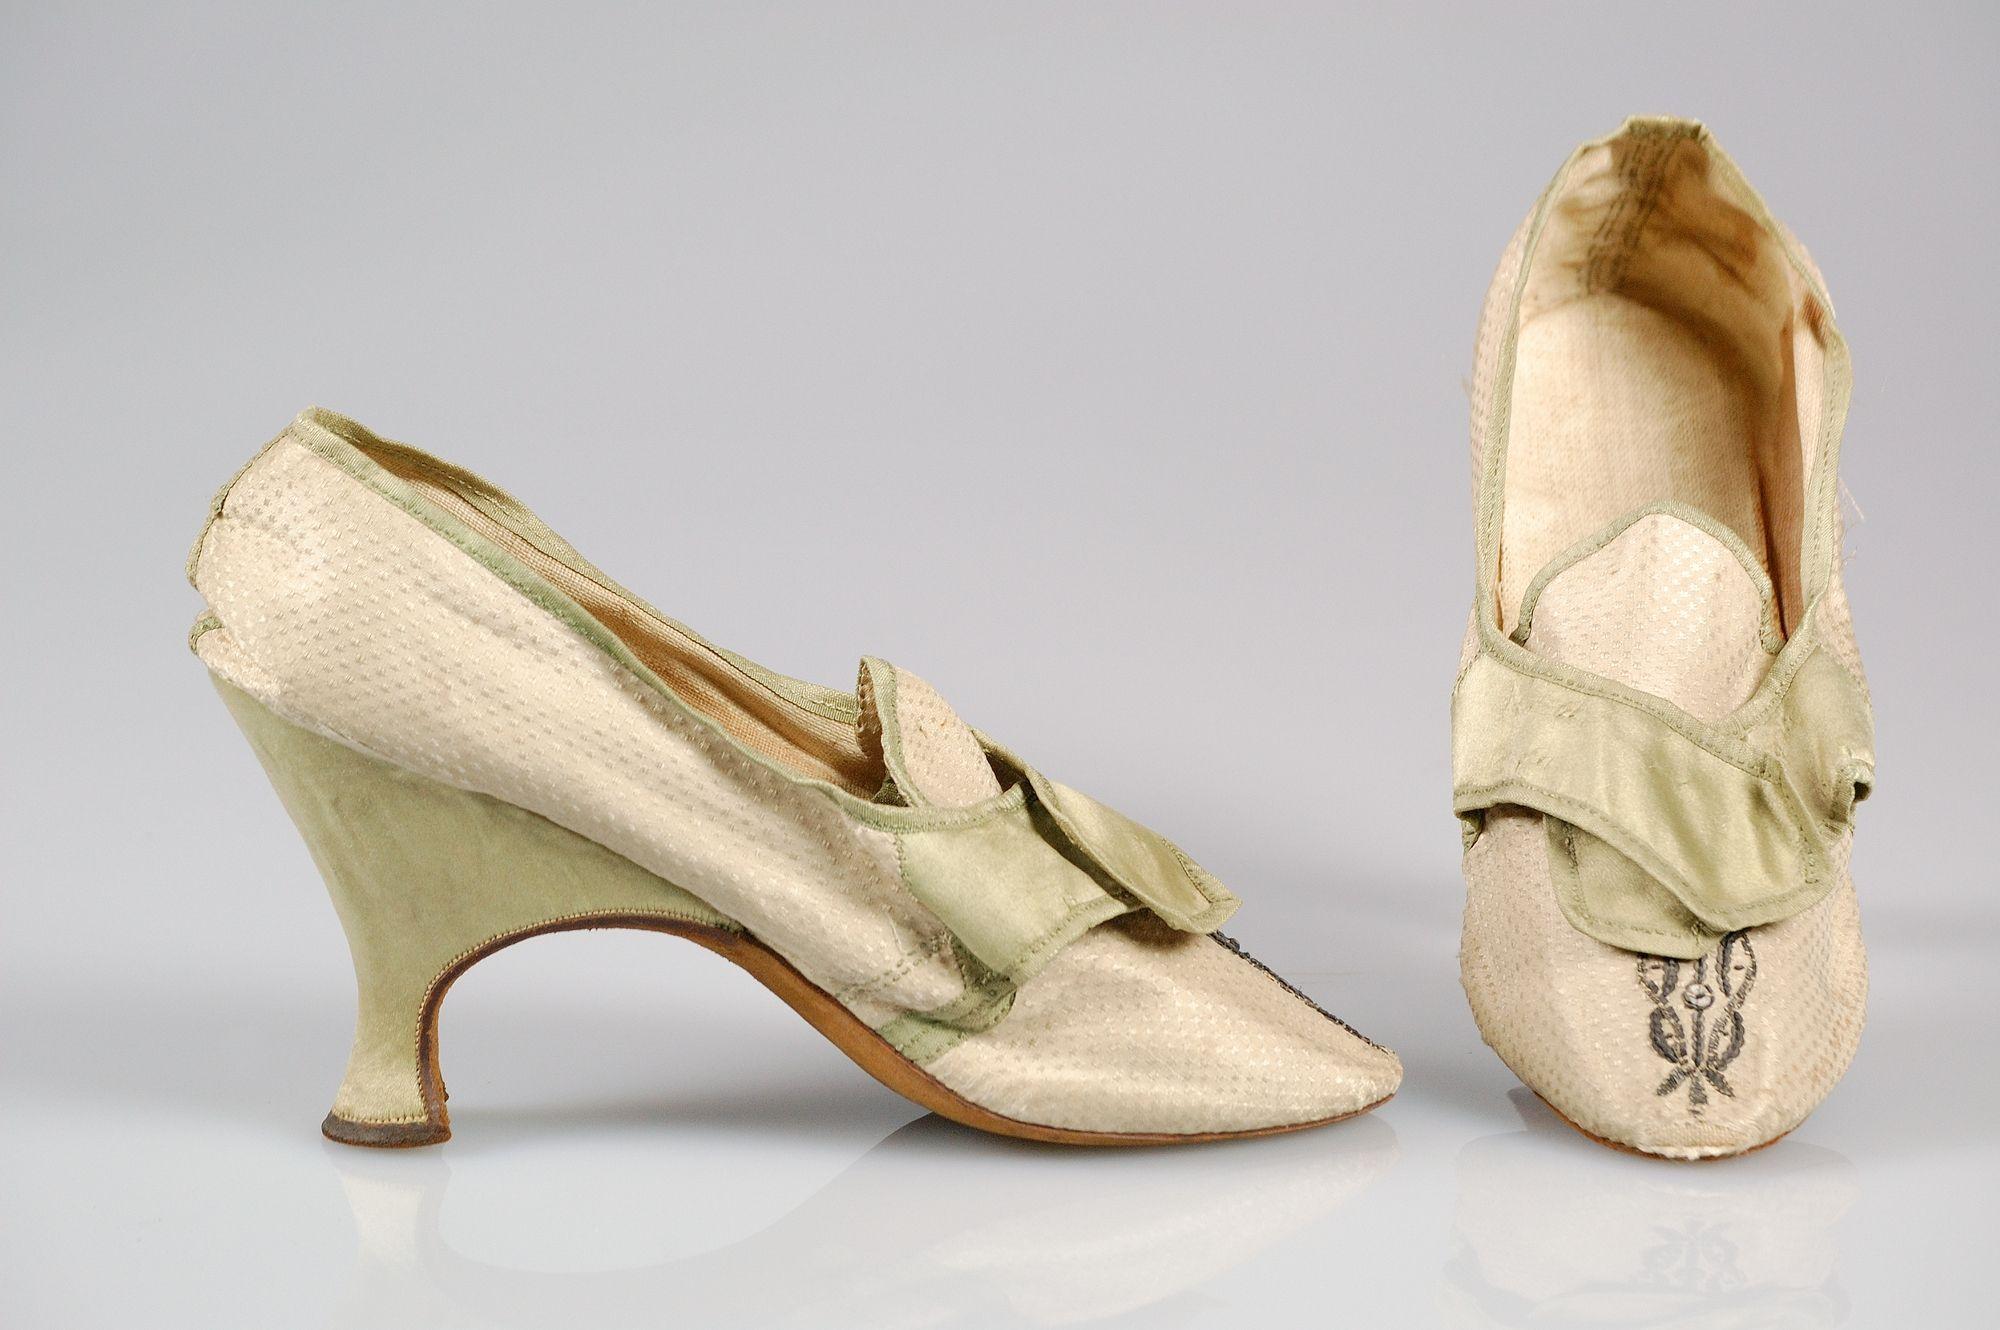 Shoes European The Met Historical Shoes Century Shoes Vintage Shoes